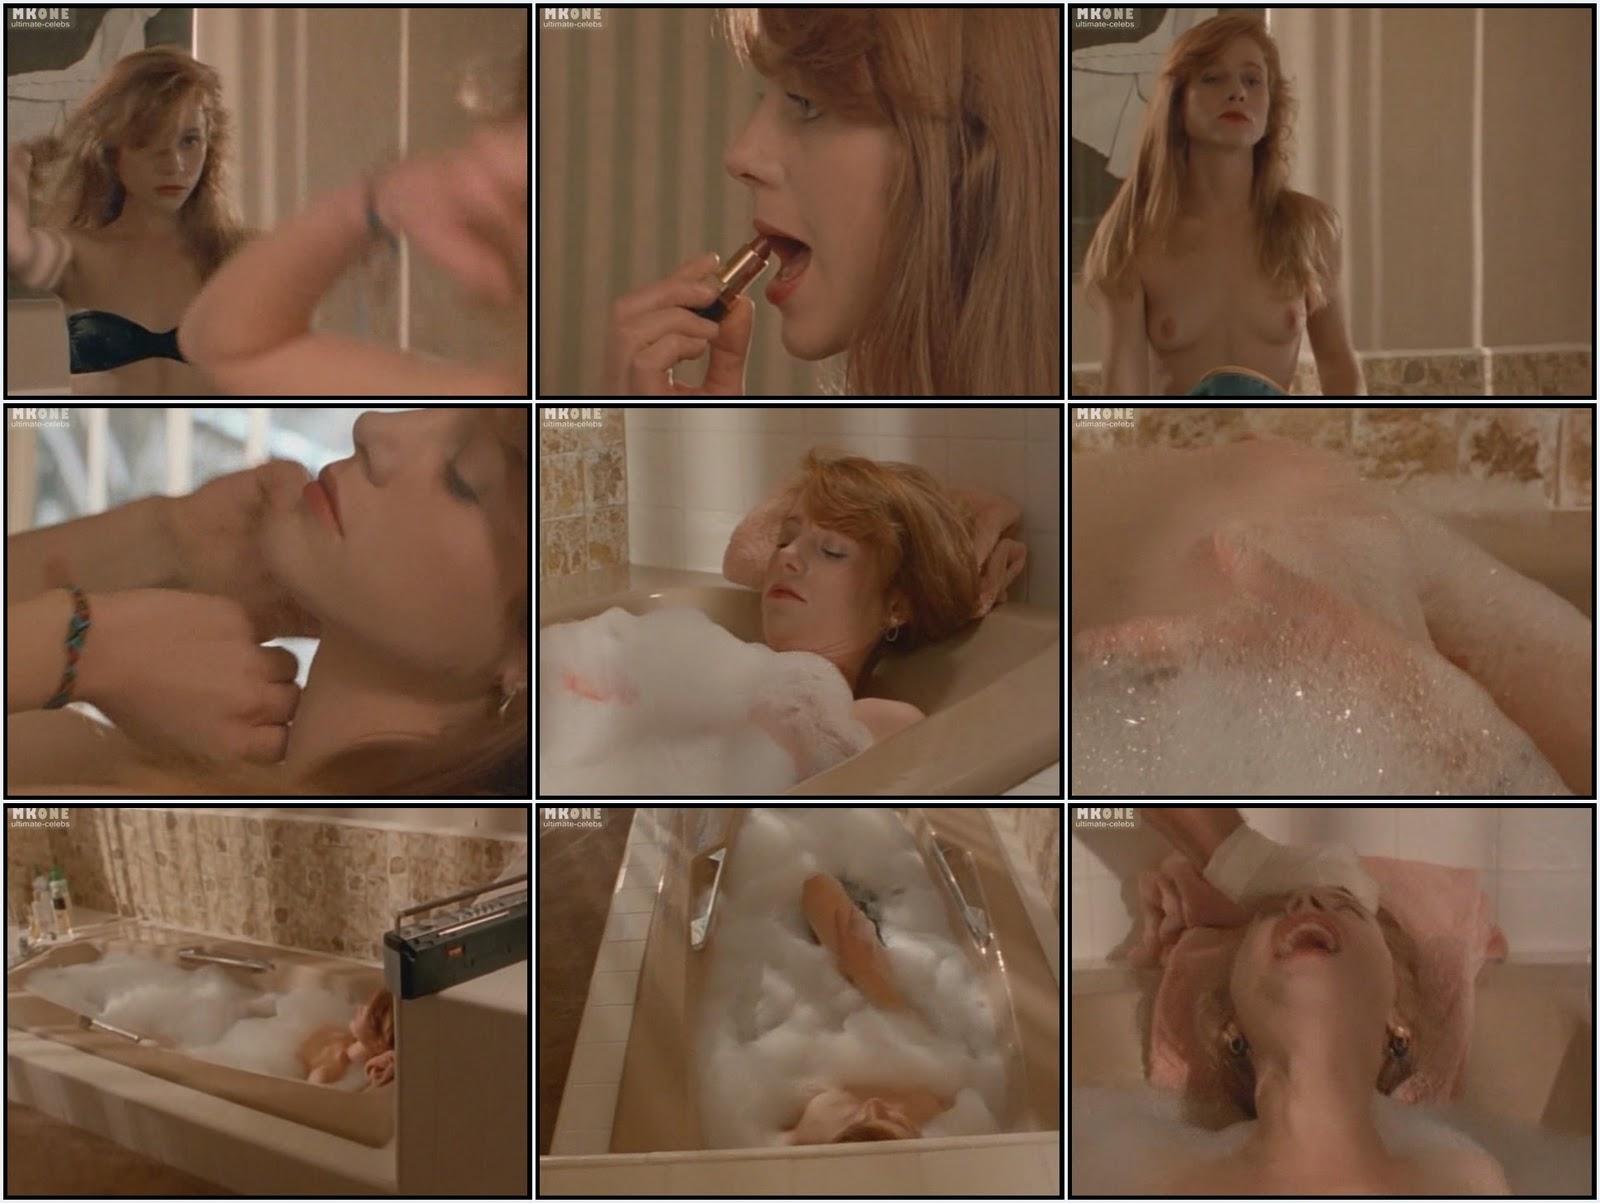 Juliette cummins nude